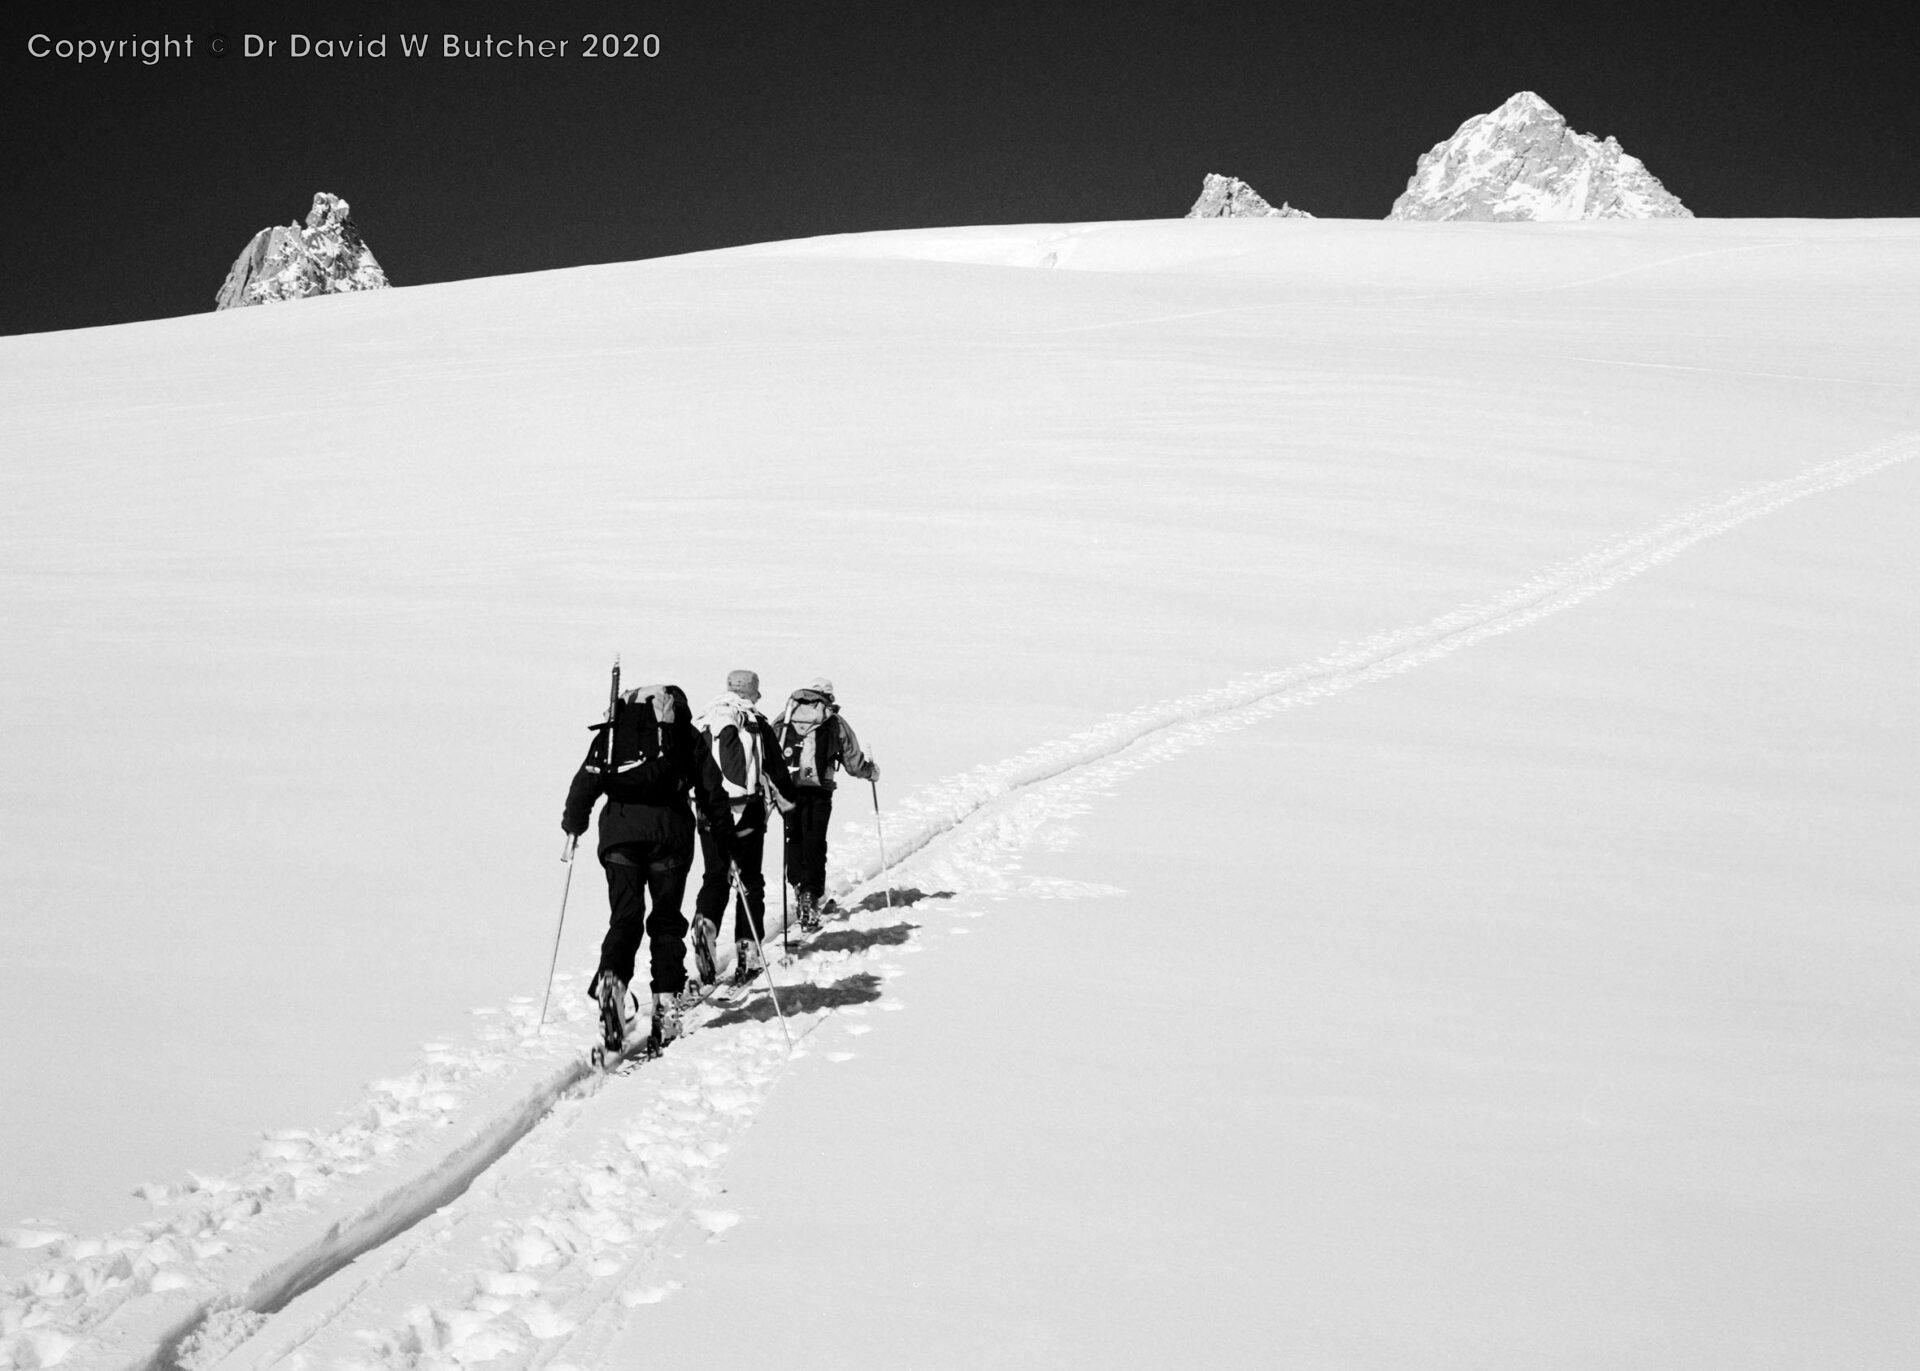 Trient, Crossing the Plateau du Trient, Switzerland